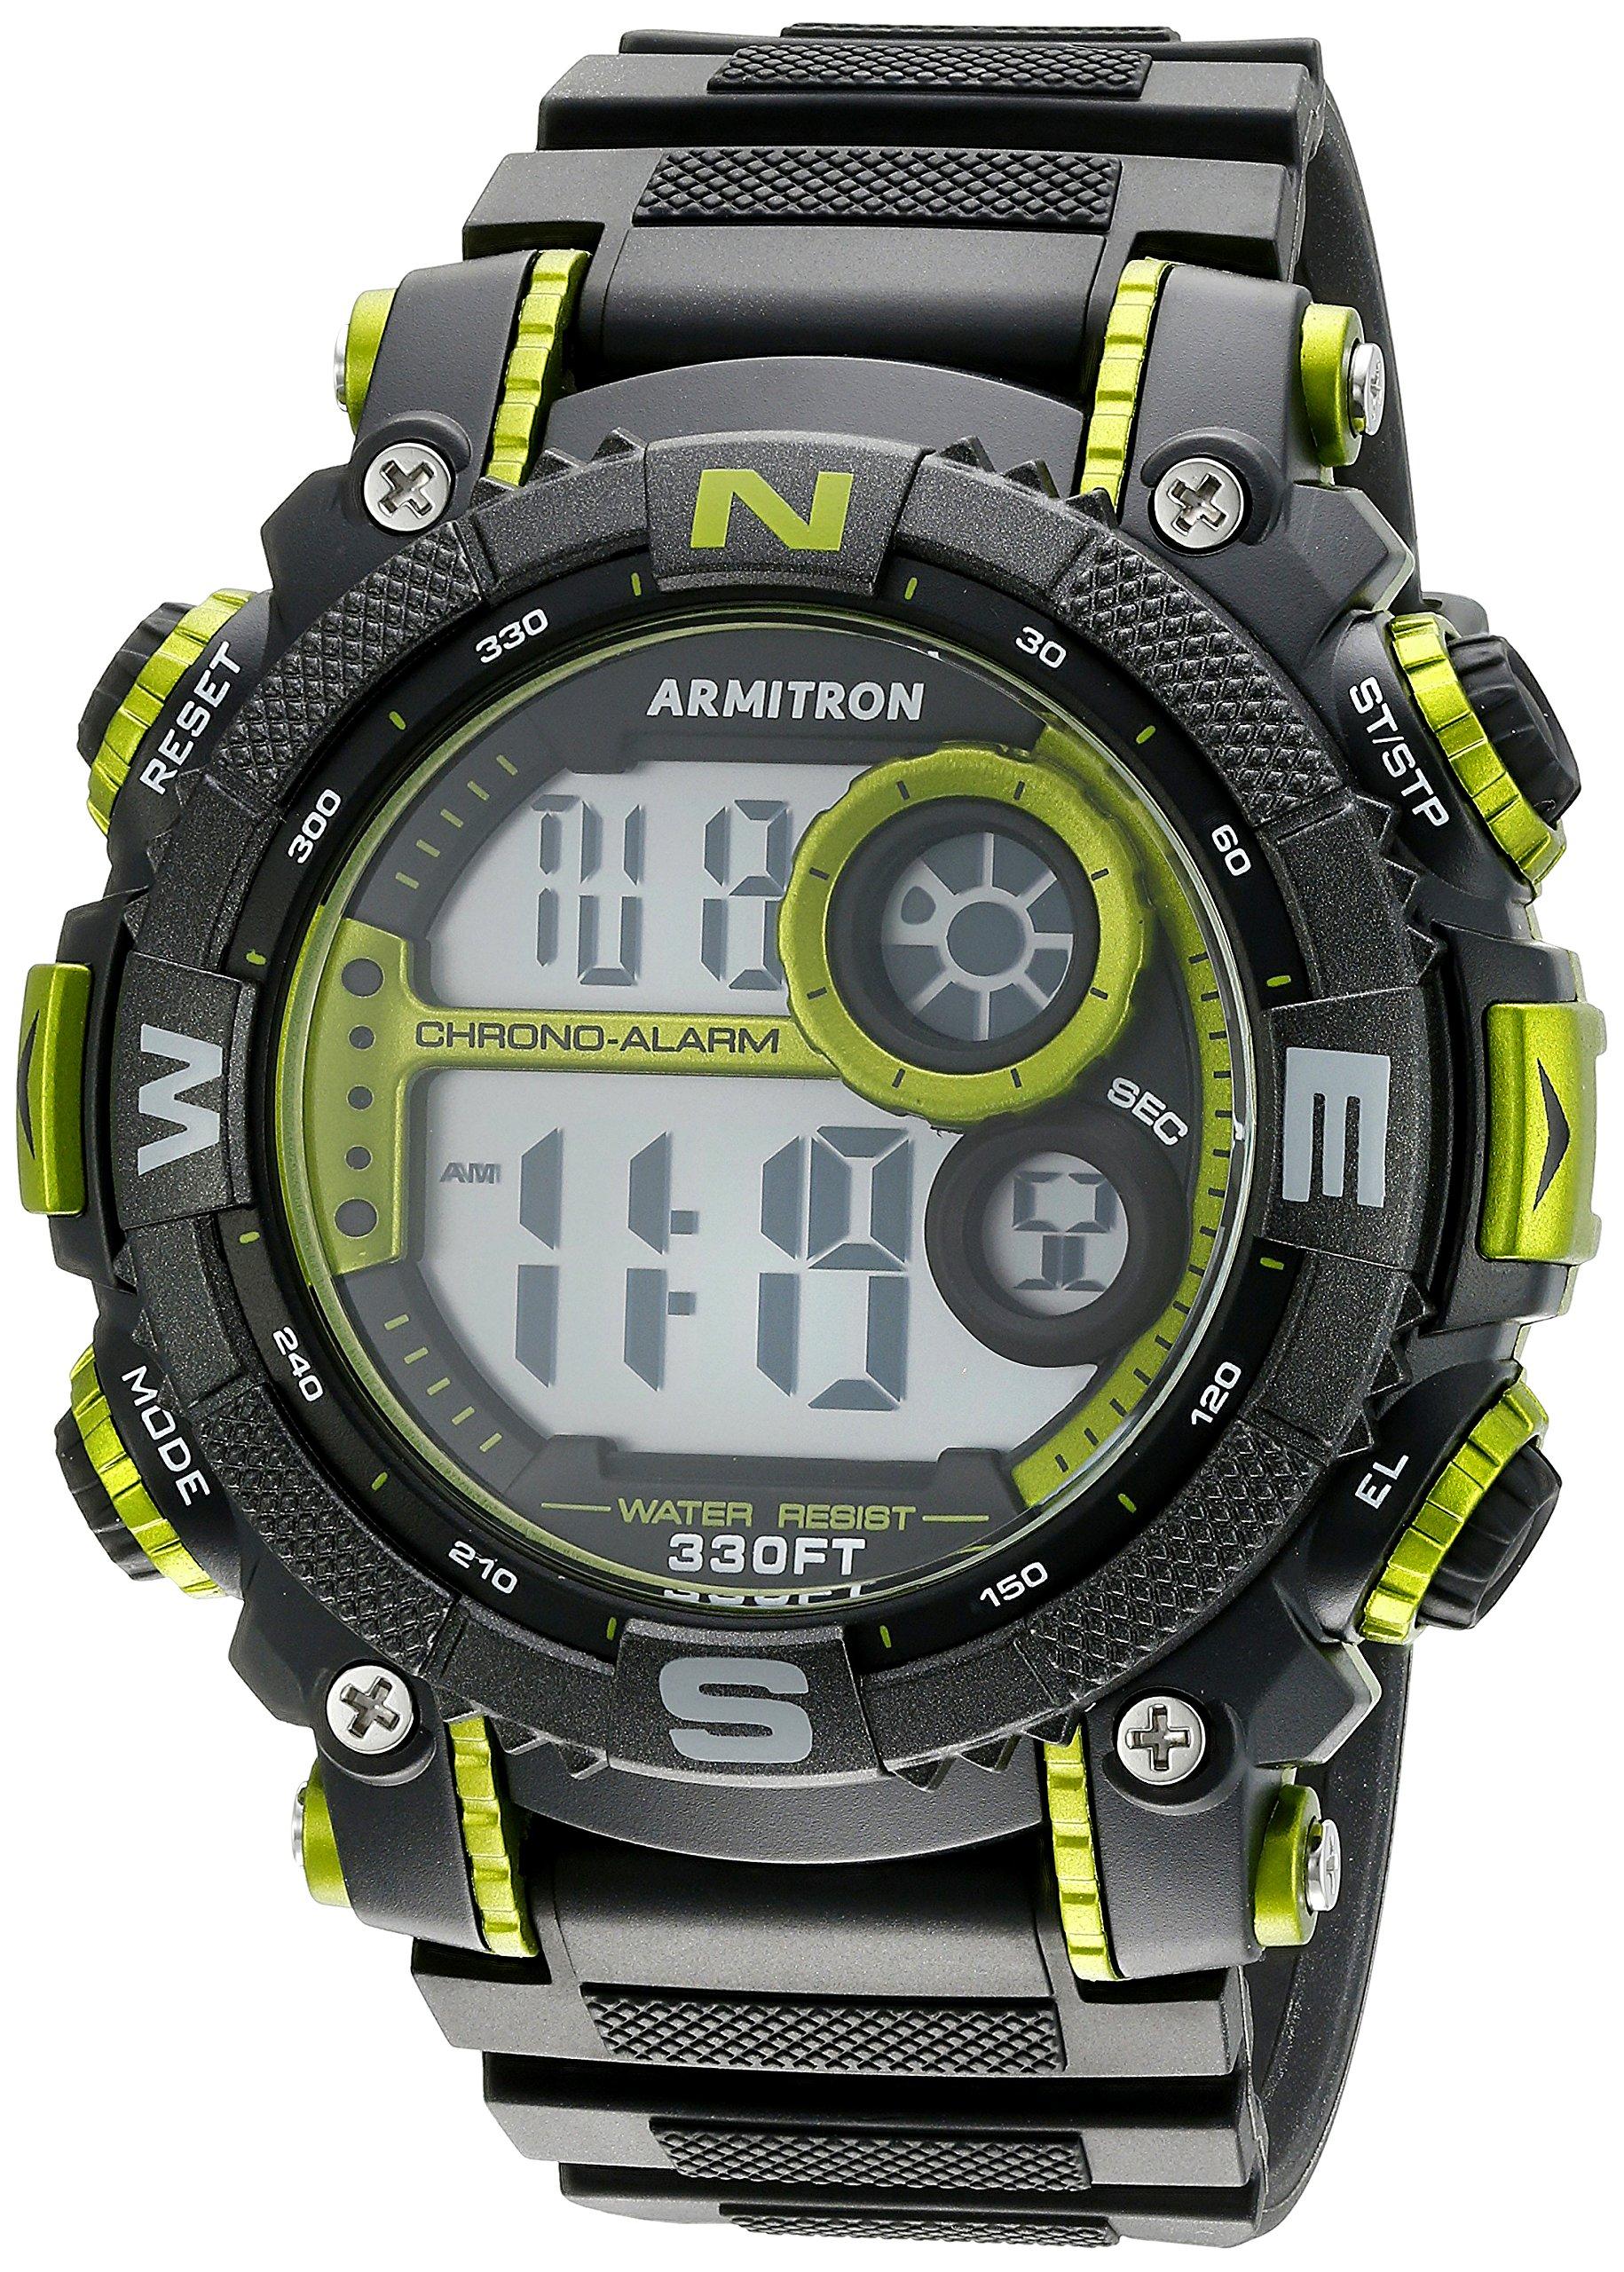 Armitron Men's 40/8284LGN Lime Green Accented Digital Chronograph Black Resin Strap Watch by Armitron Sport